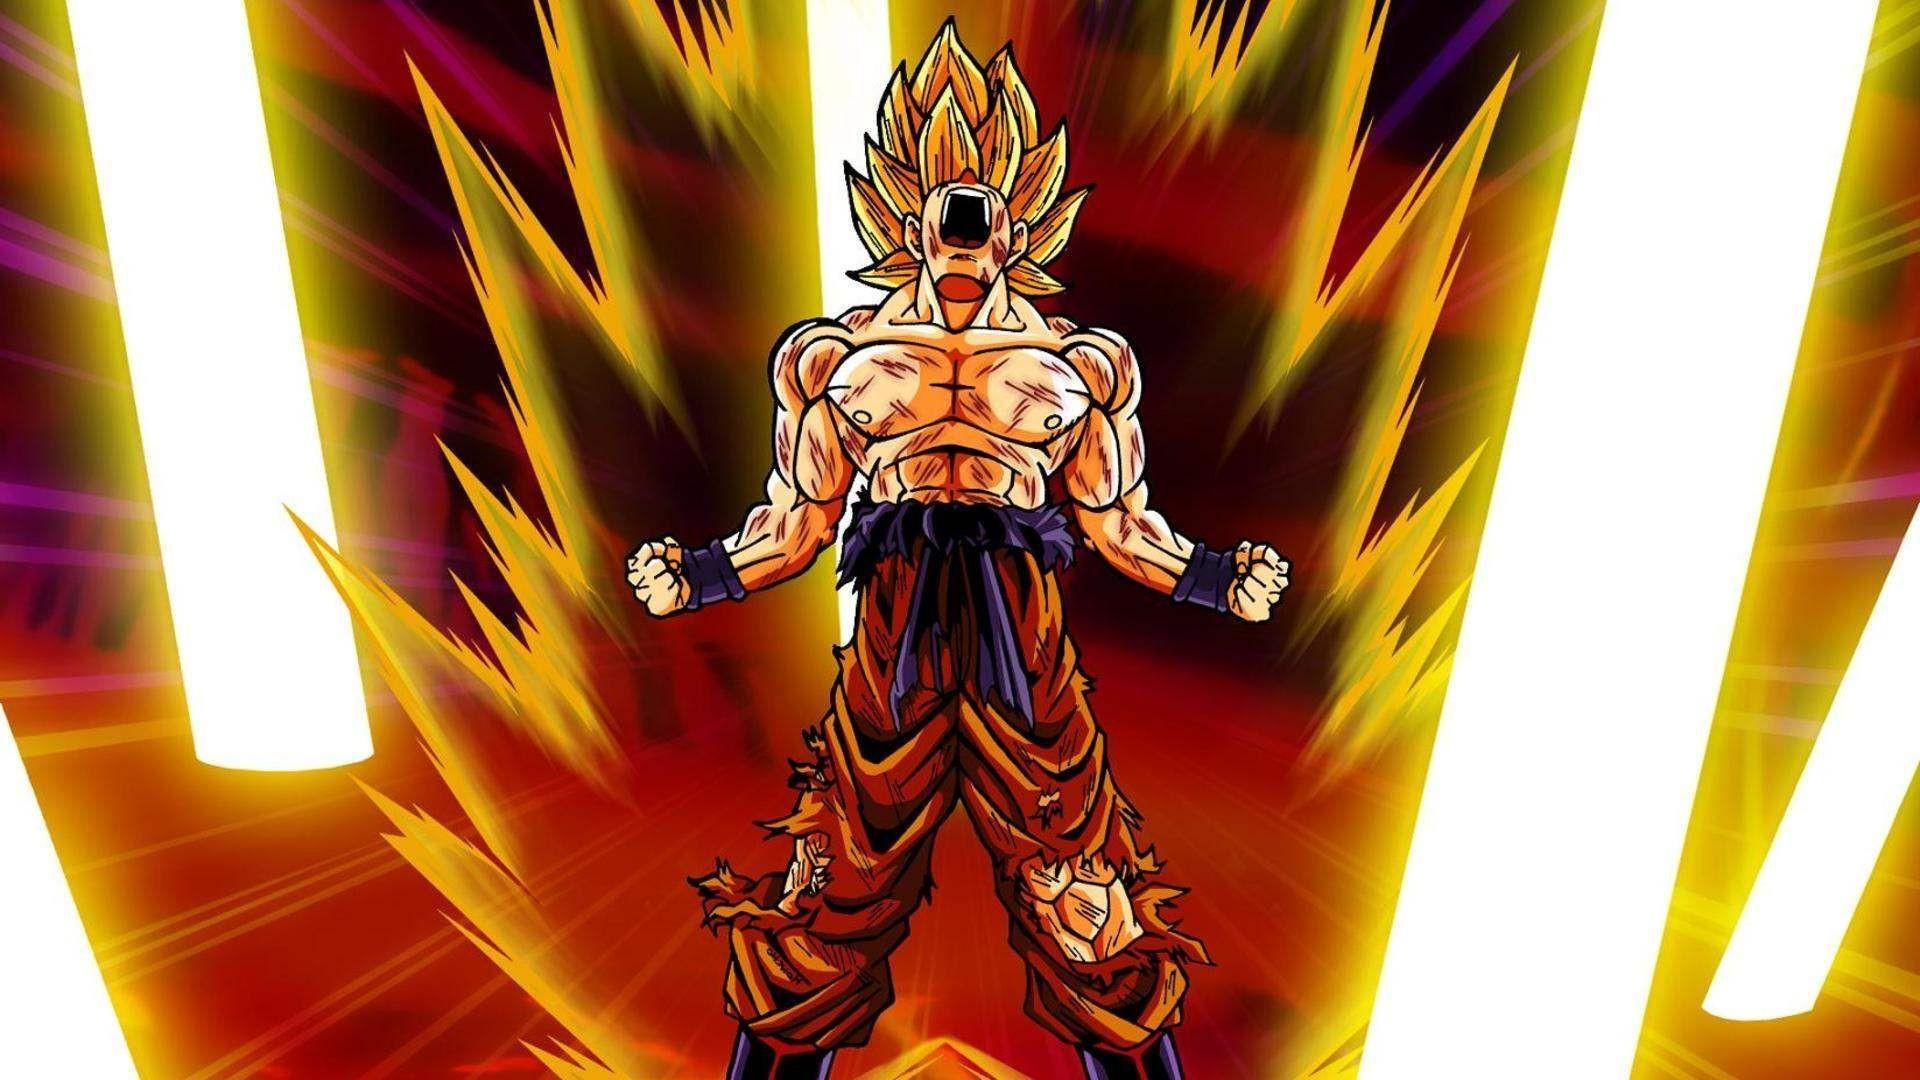 Goku Super Saiyan Wallpaper 72 images 1920x1080